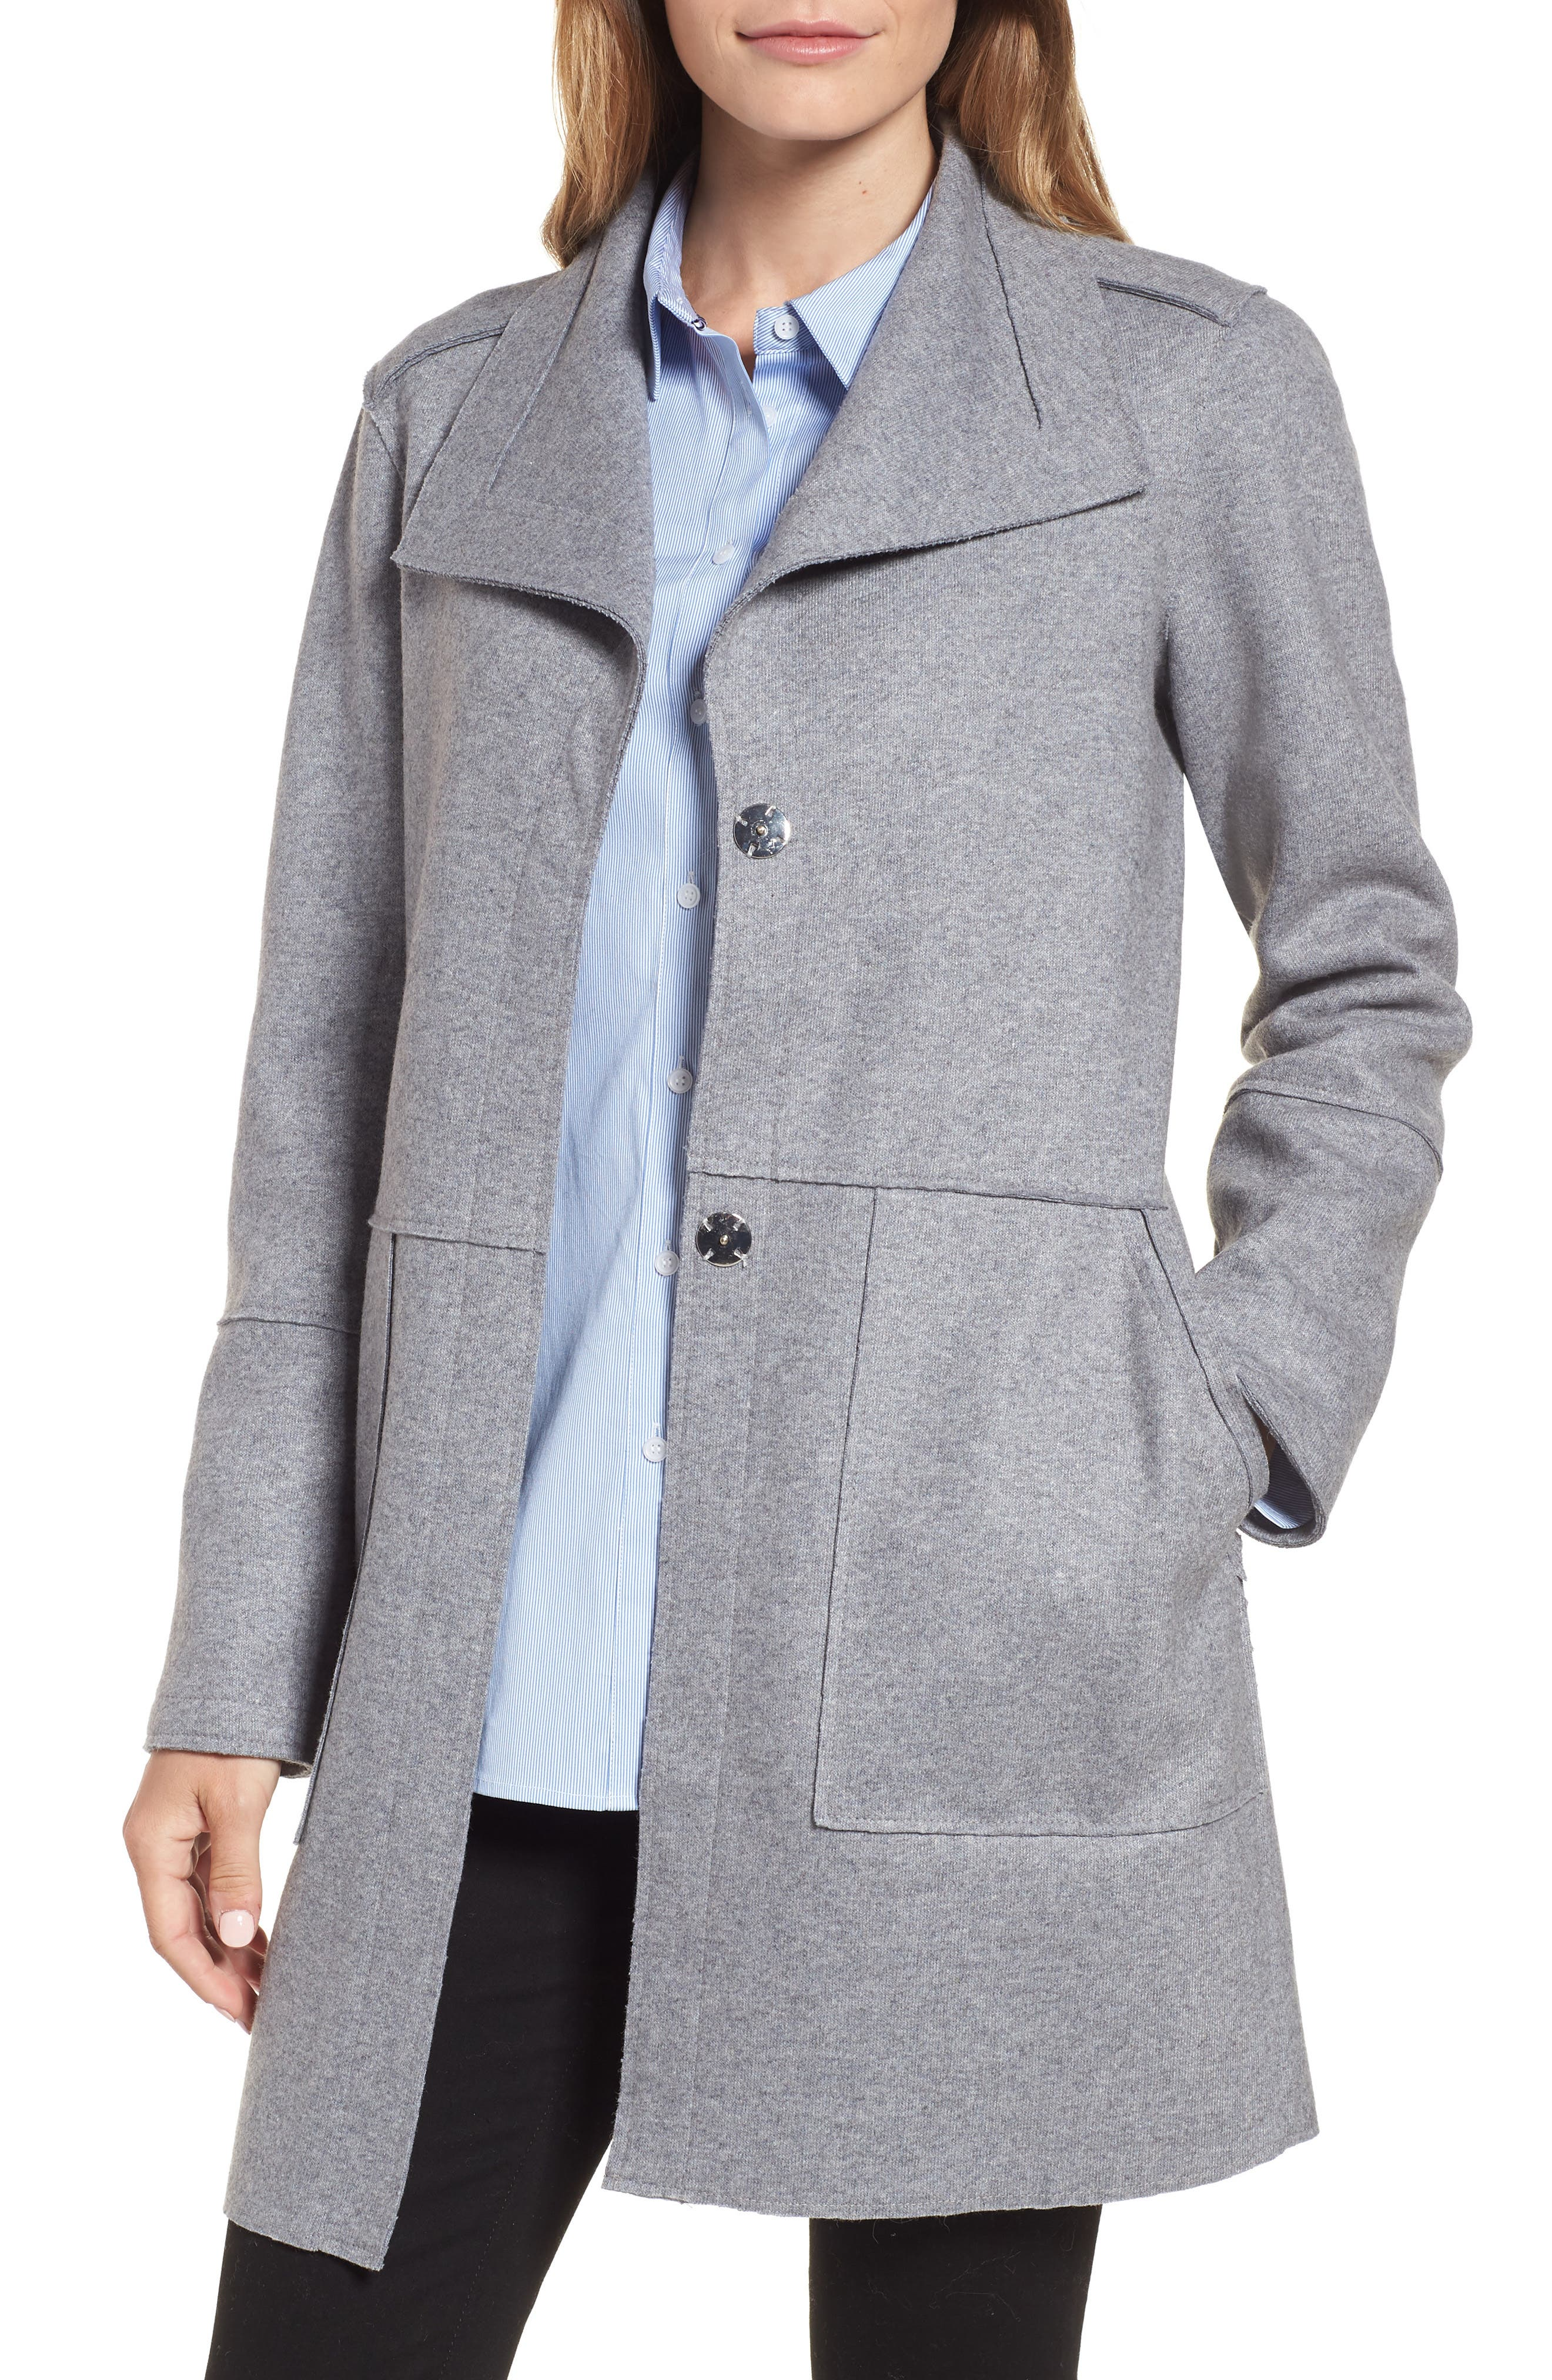 Envelope Collar Wool Blend Knit Coat,                         Main,                         color, LIGHT GREY